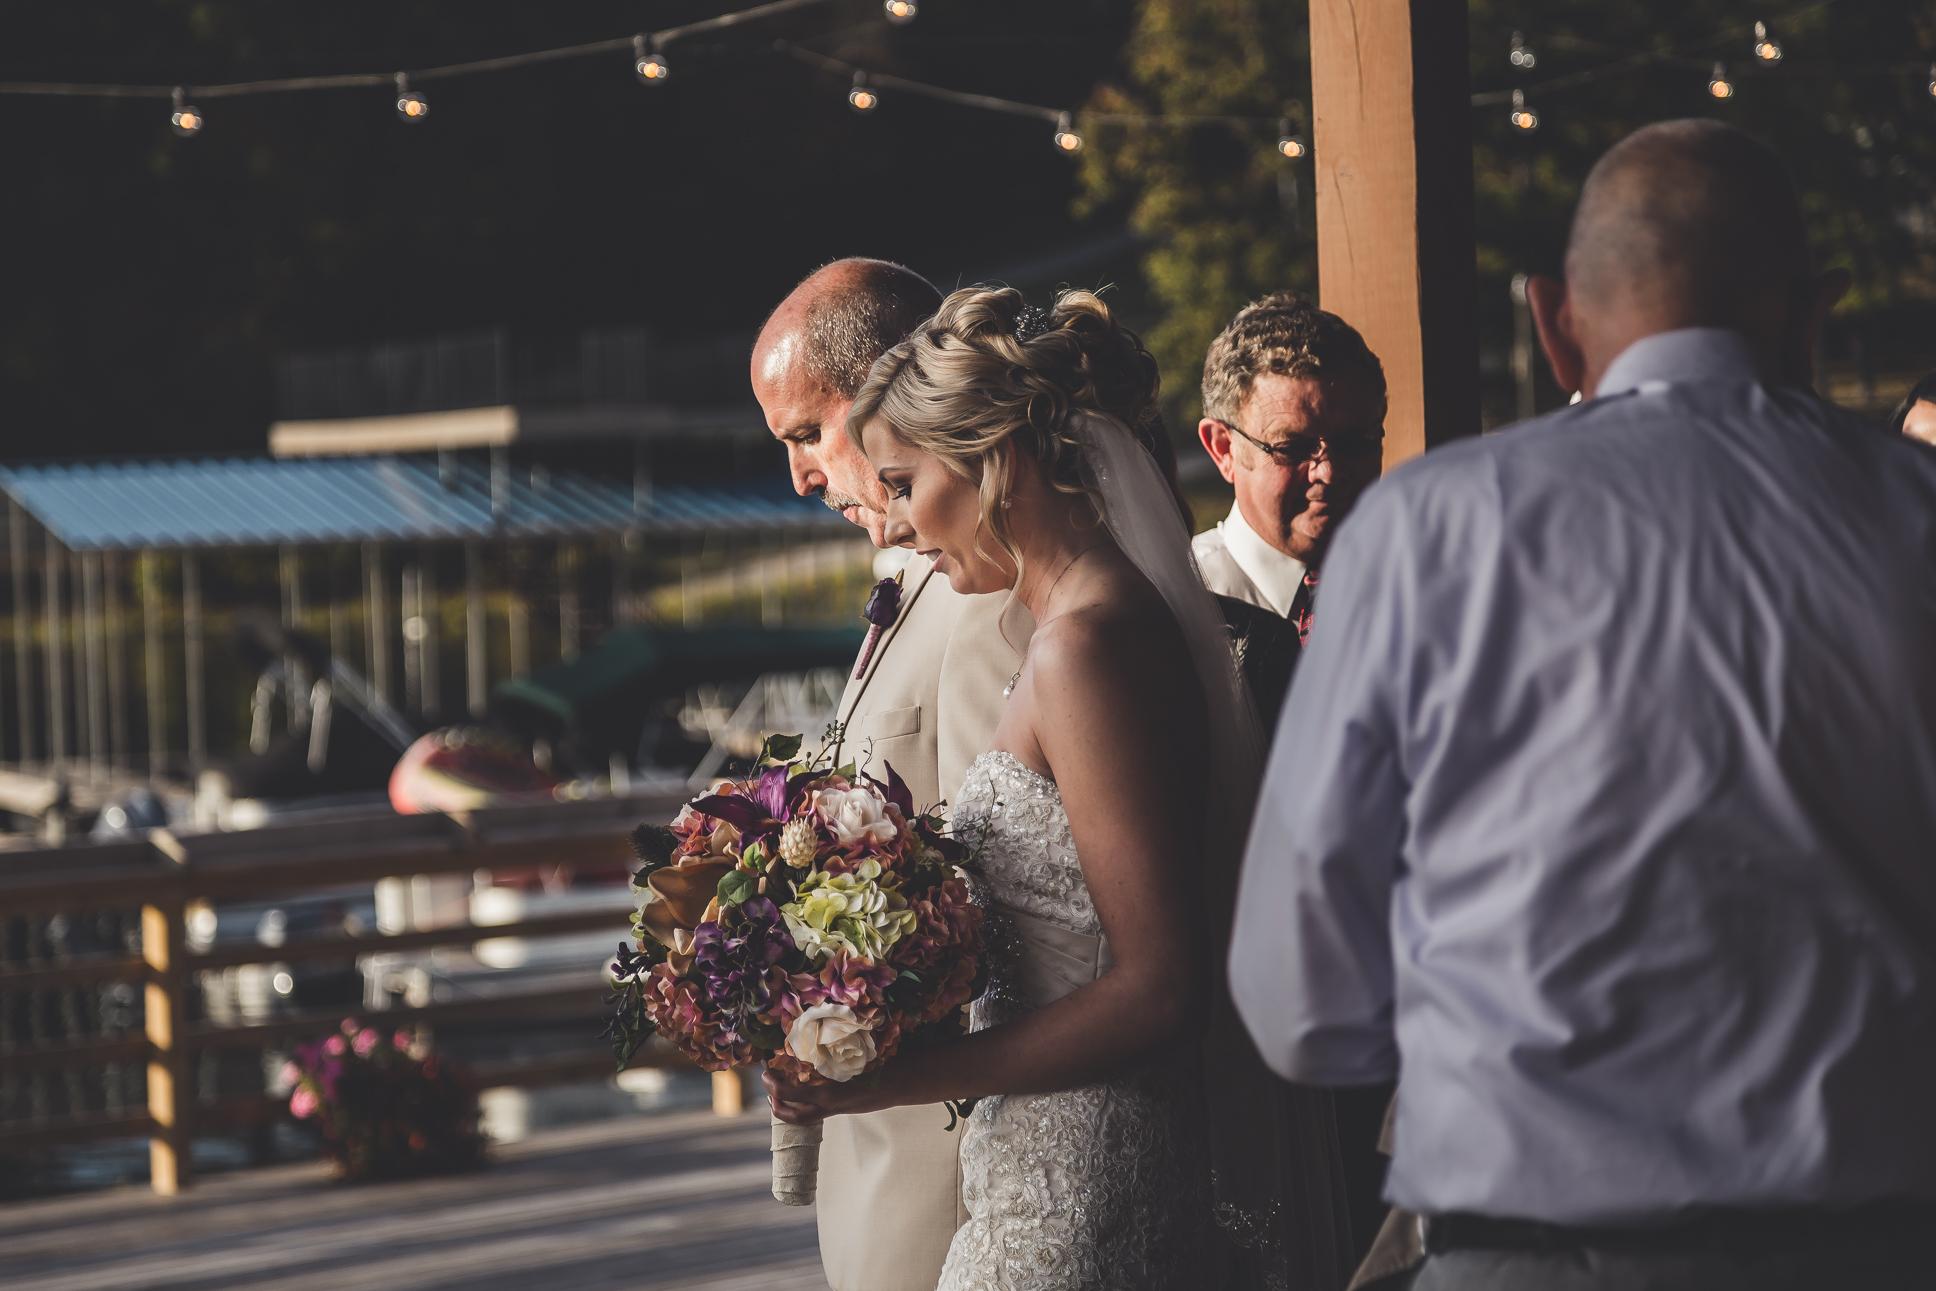 Southern Illinois Wedding Photography - Dustin Morrison Photography - Byrne Wedding-49.jpg